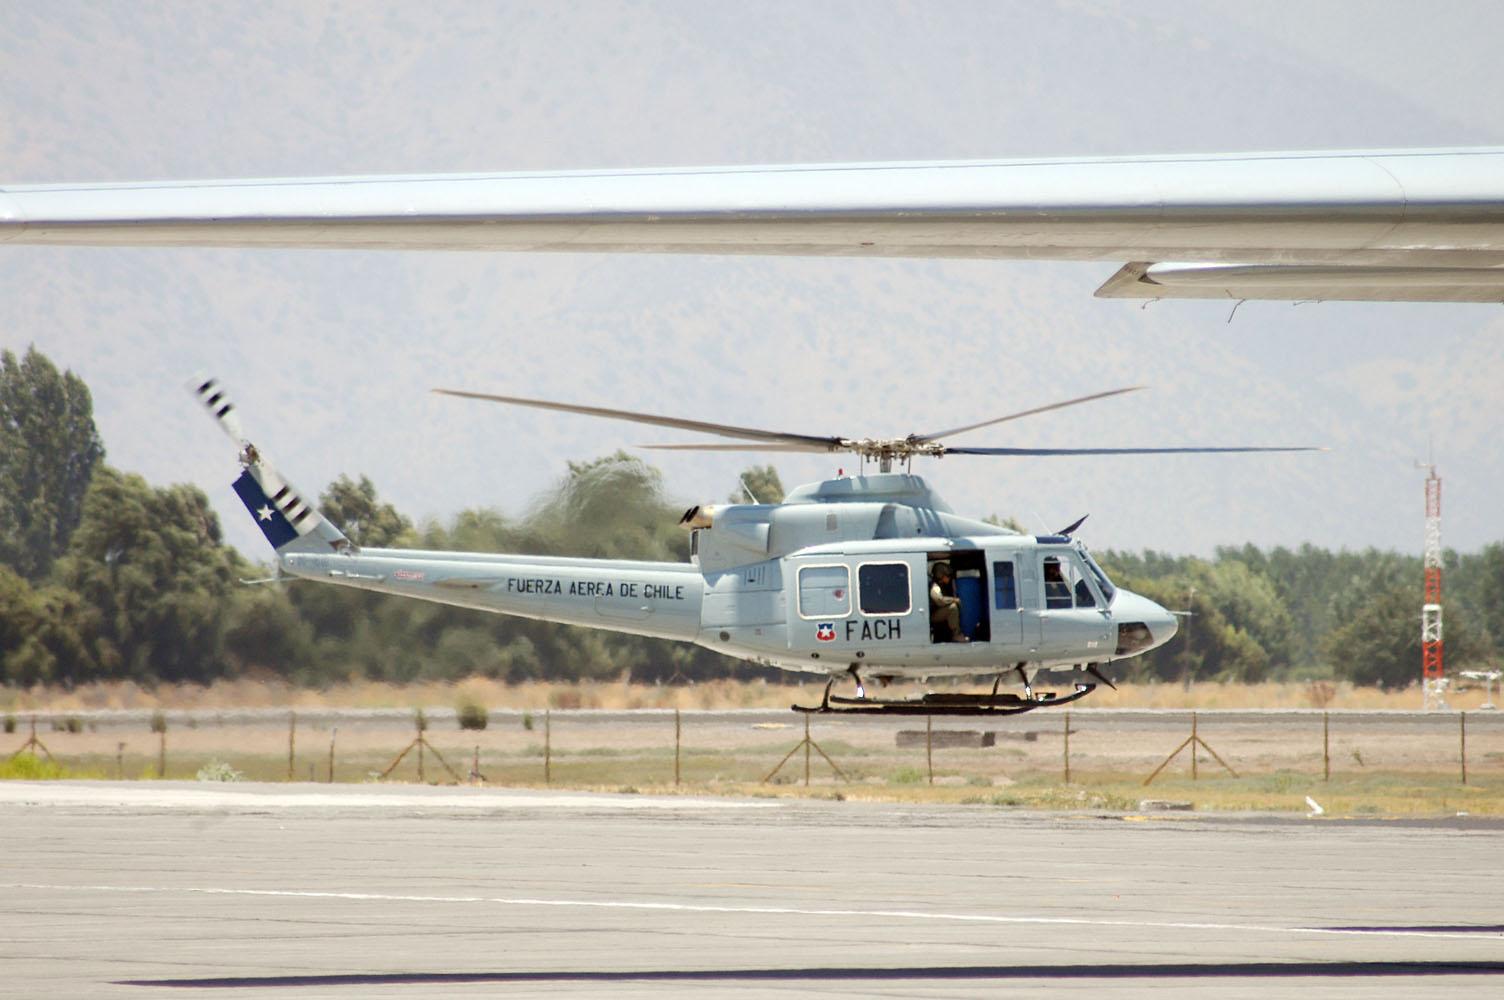 Bell 412 Chile - foto FACH